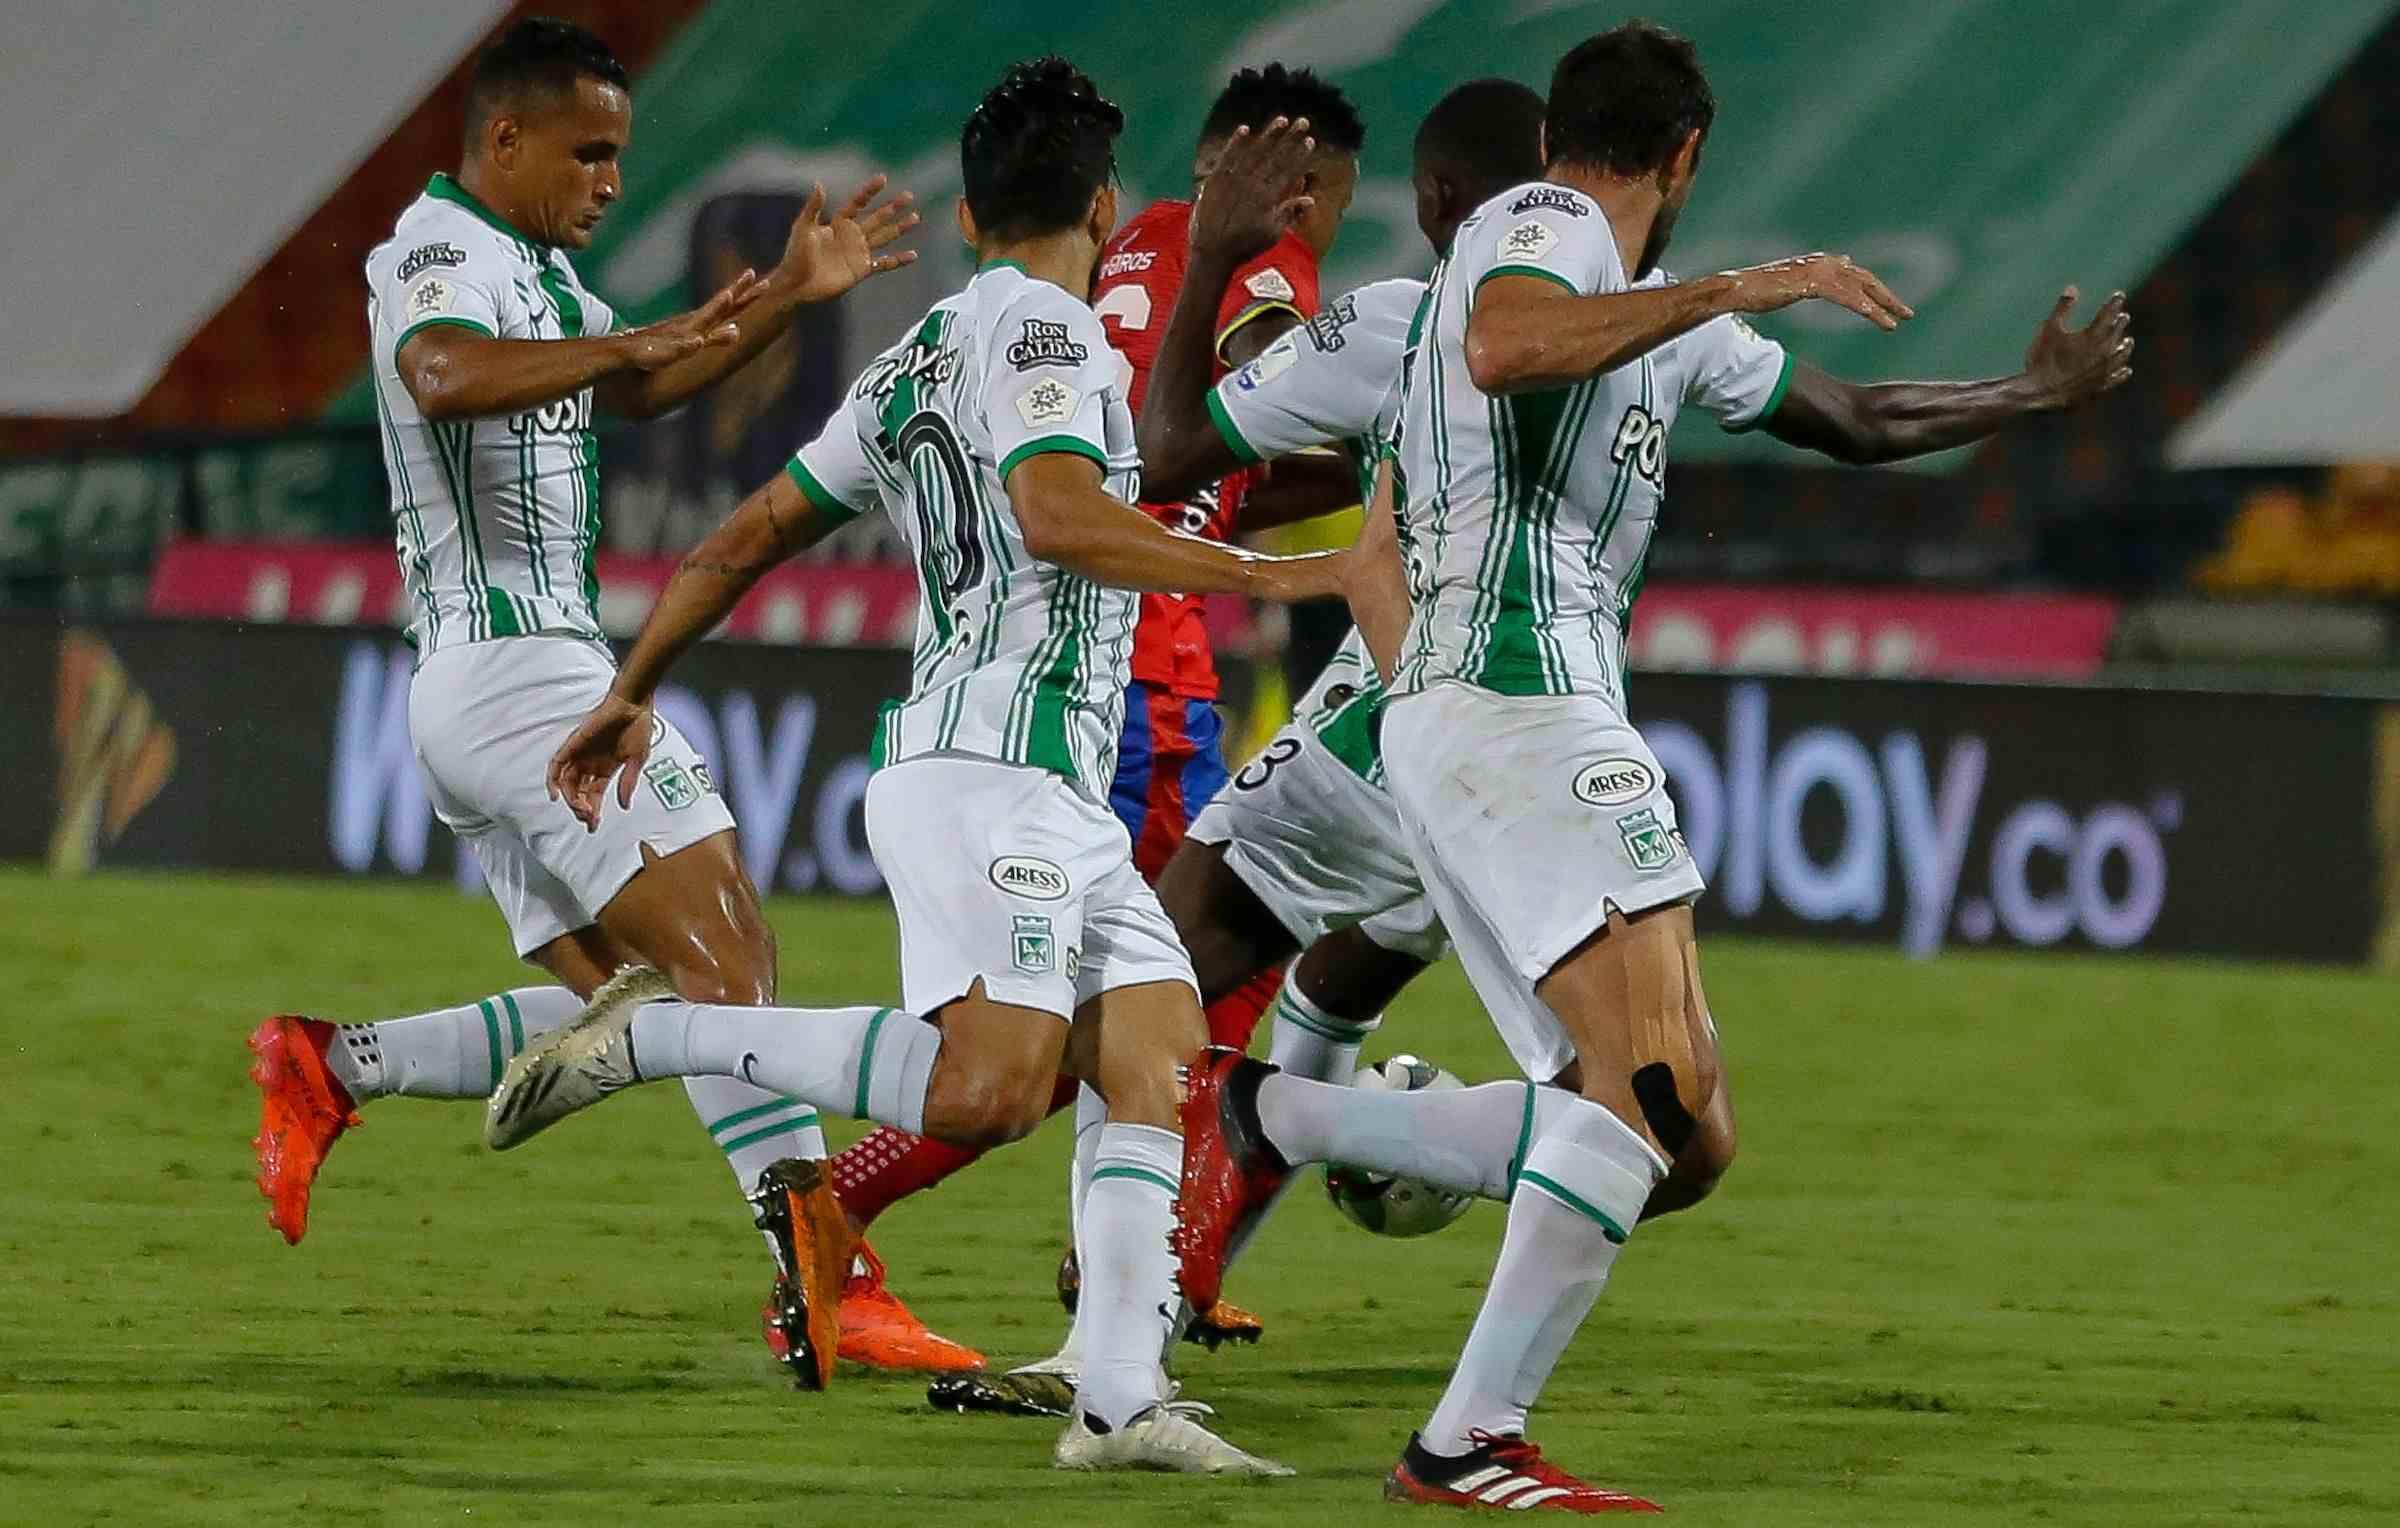 Liga Betplay: Nacional gana por W a Cúcuta Deportivo, confirmó Dimayor | Antena 2